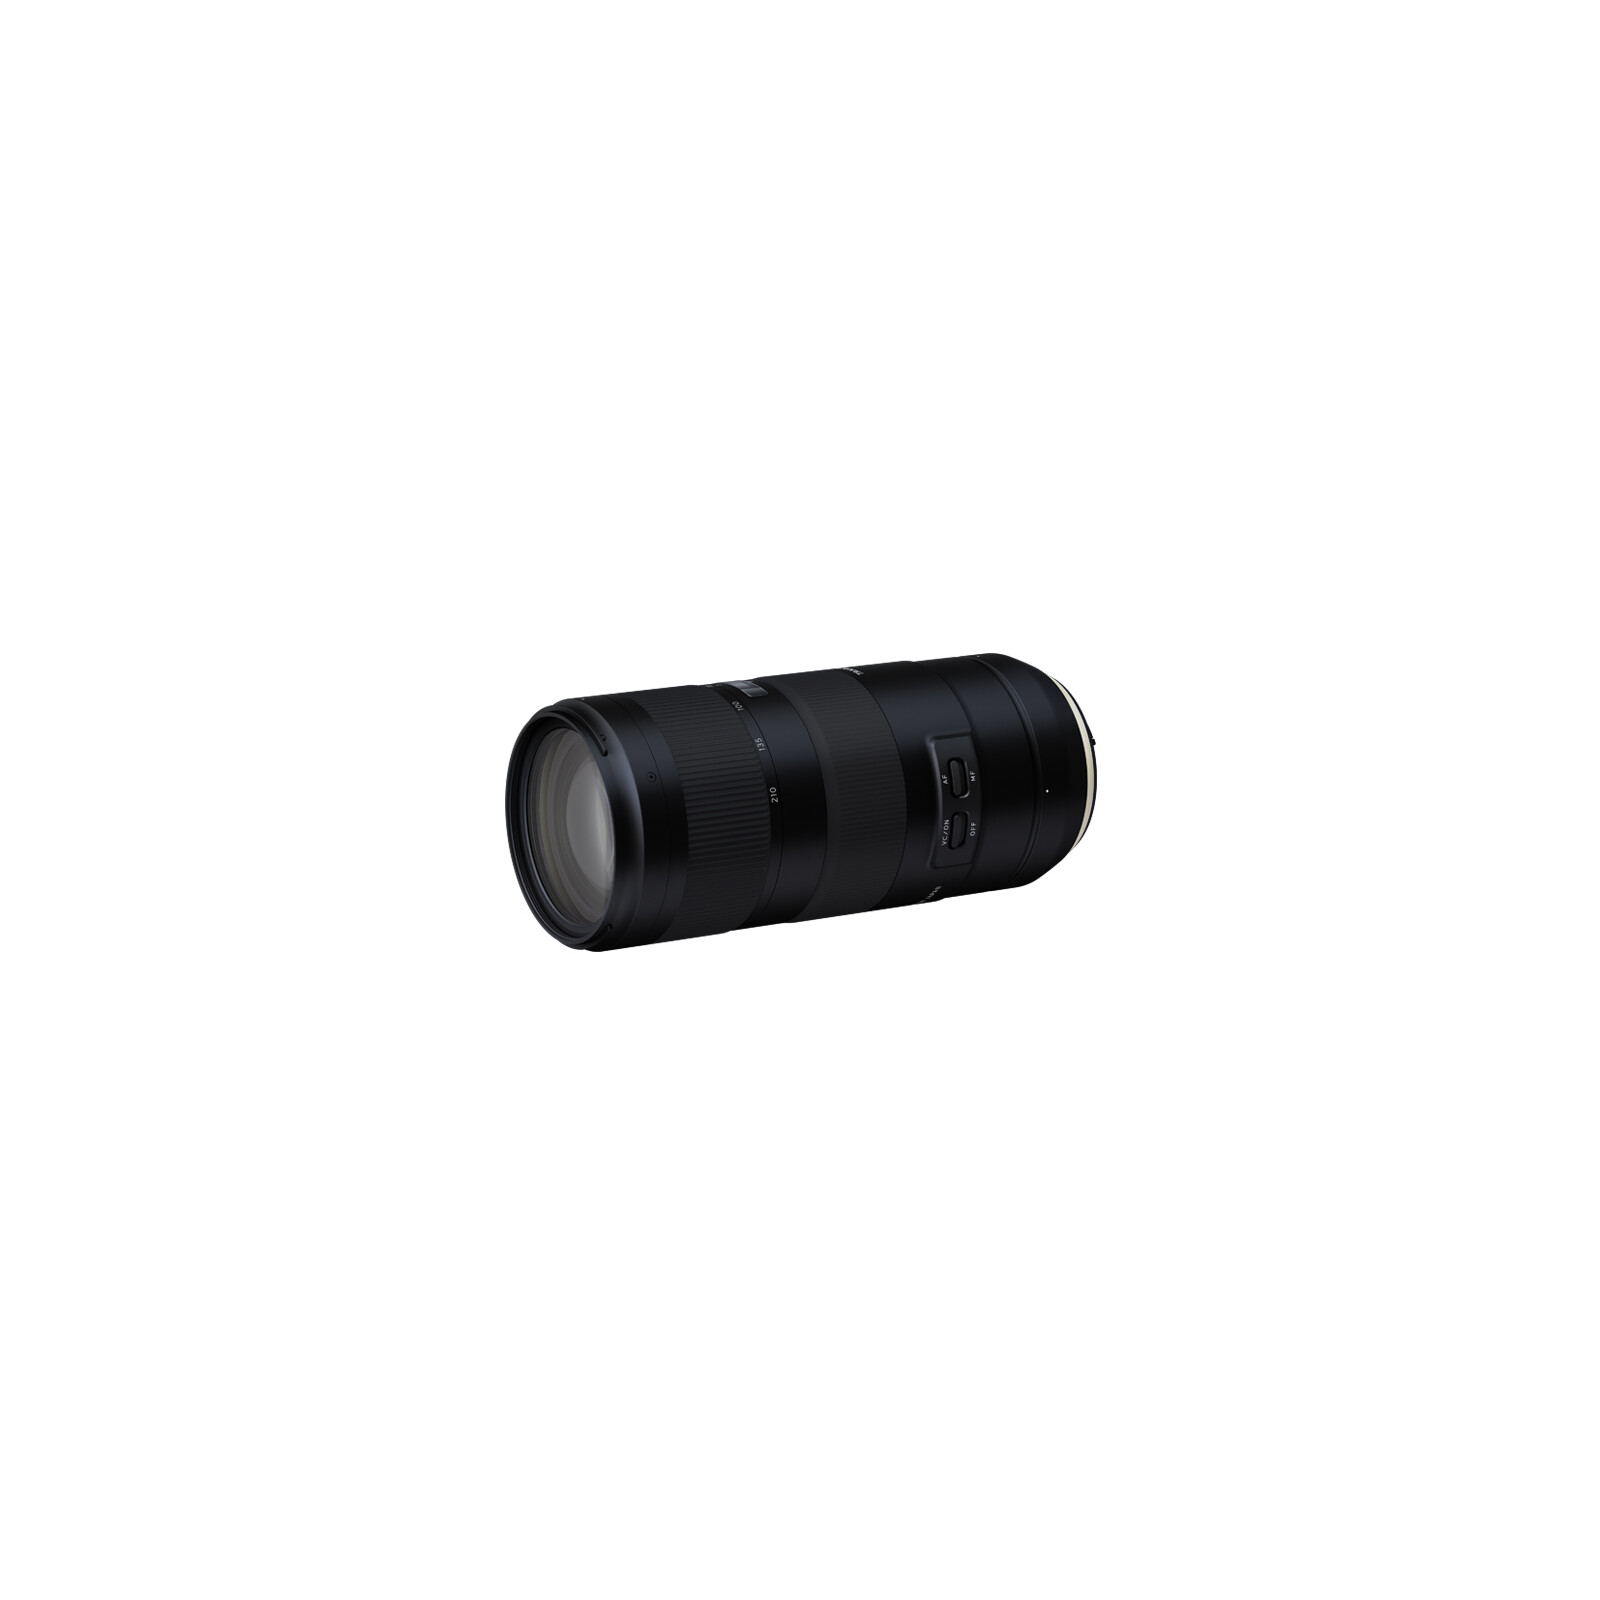 Tamron 70-210/4,0 DI VC USD Nikon + GRATIS Stativschelle